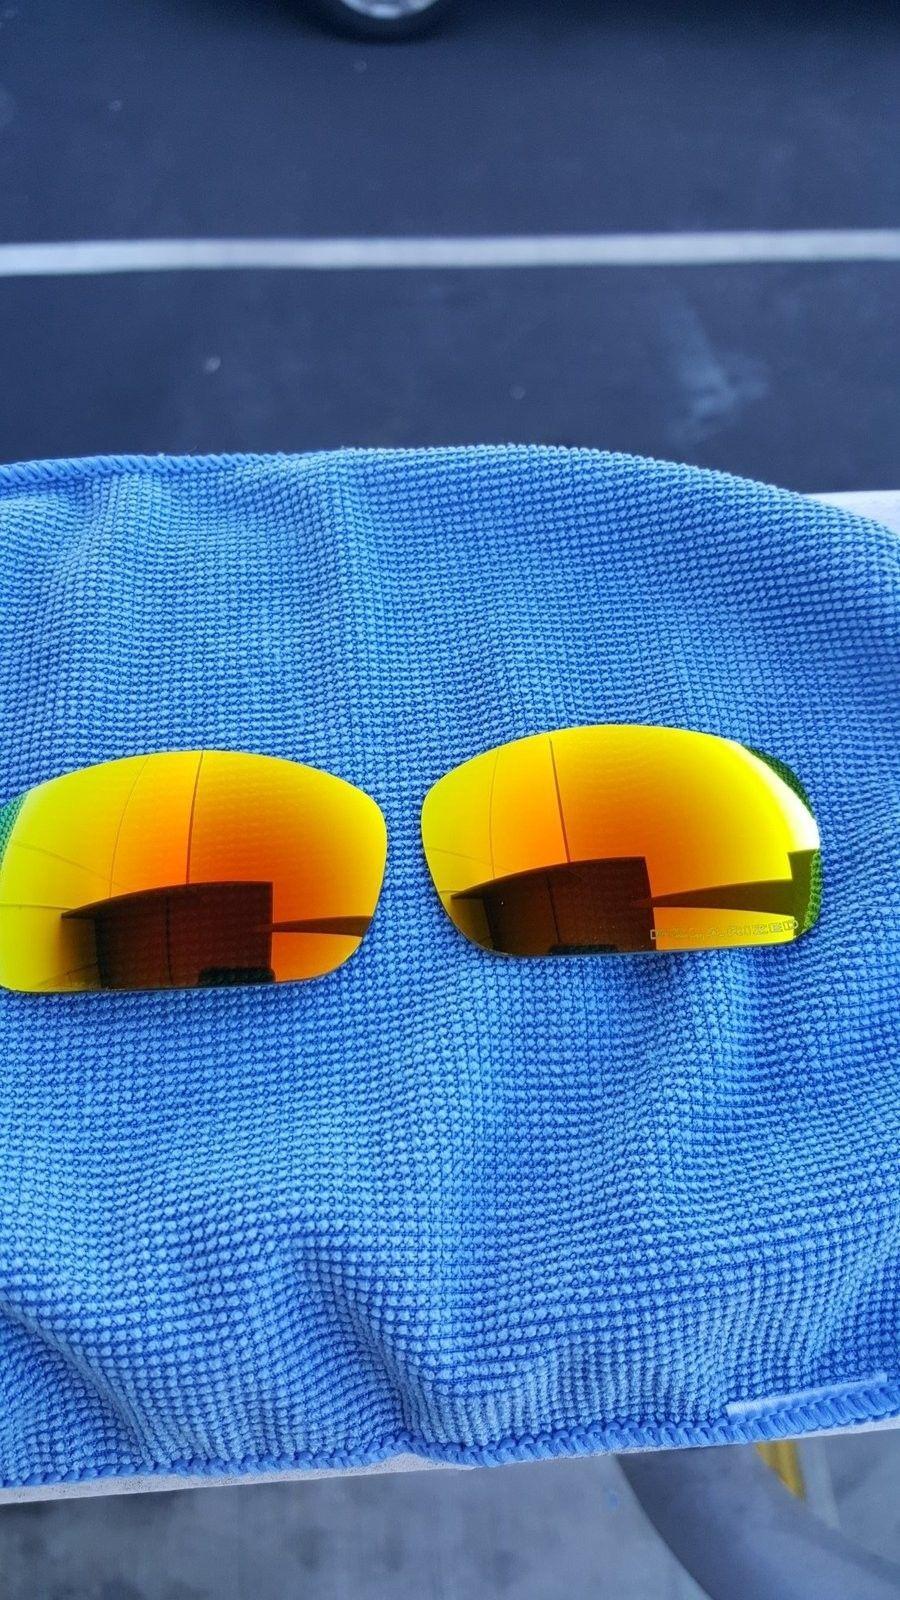 70.00 SHIPPED -Price Drop-  Fire Polarized - OEM Lens - X Squared - 20151111_092401.jpg.jpeg